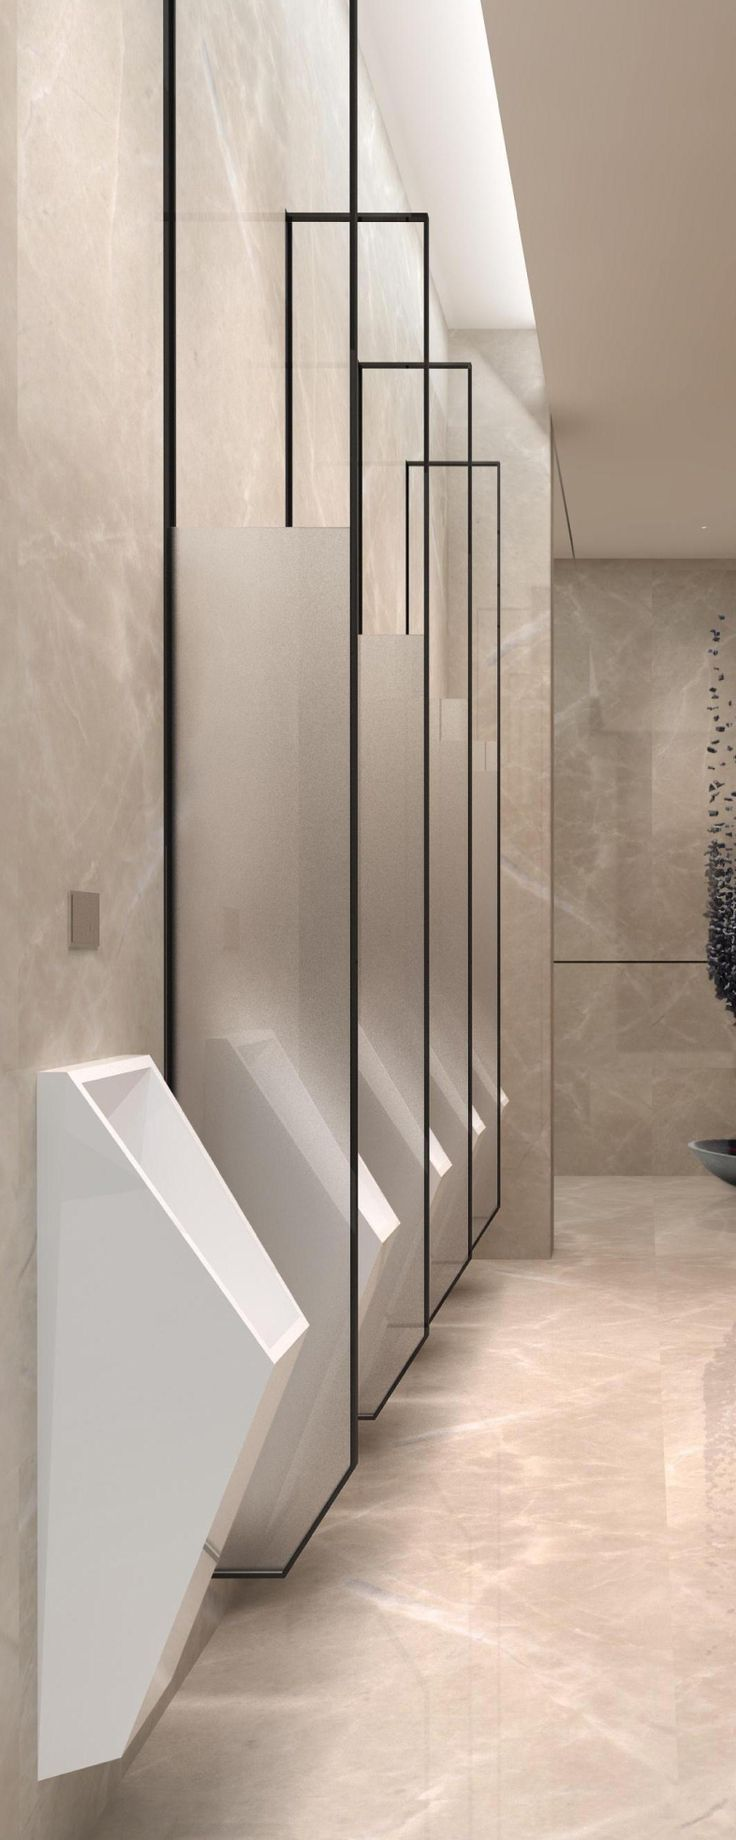 Architectural Restroom Design Contemporary Architectural Contemporary Design Hotelbathroomdesigns Washroom Design Public Restroom Design Restroom Design